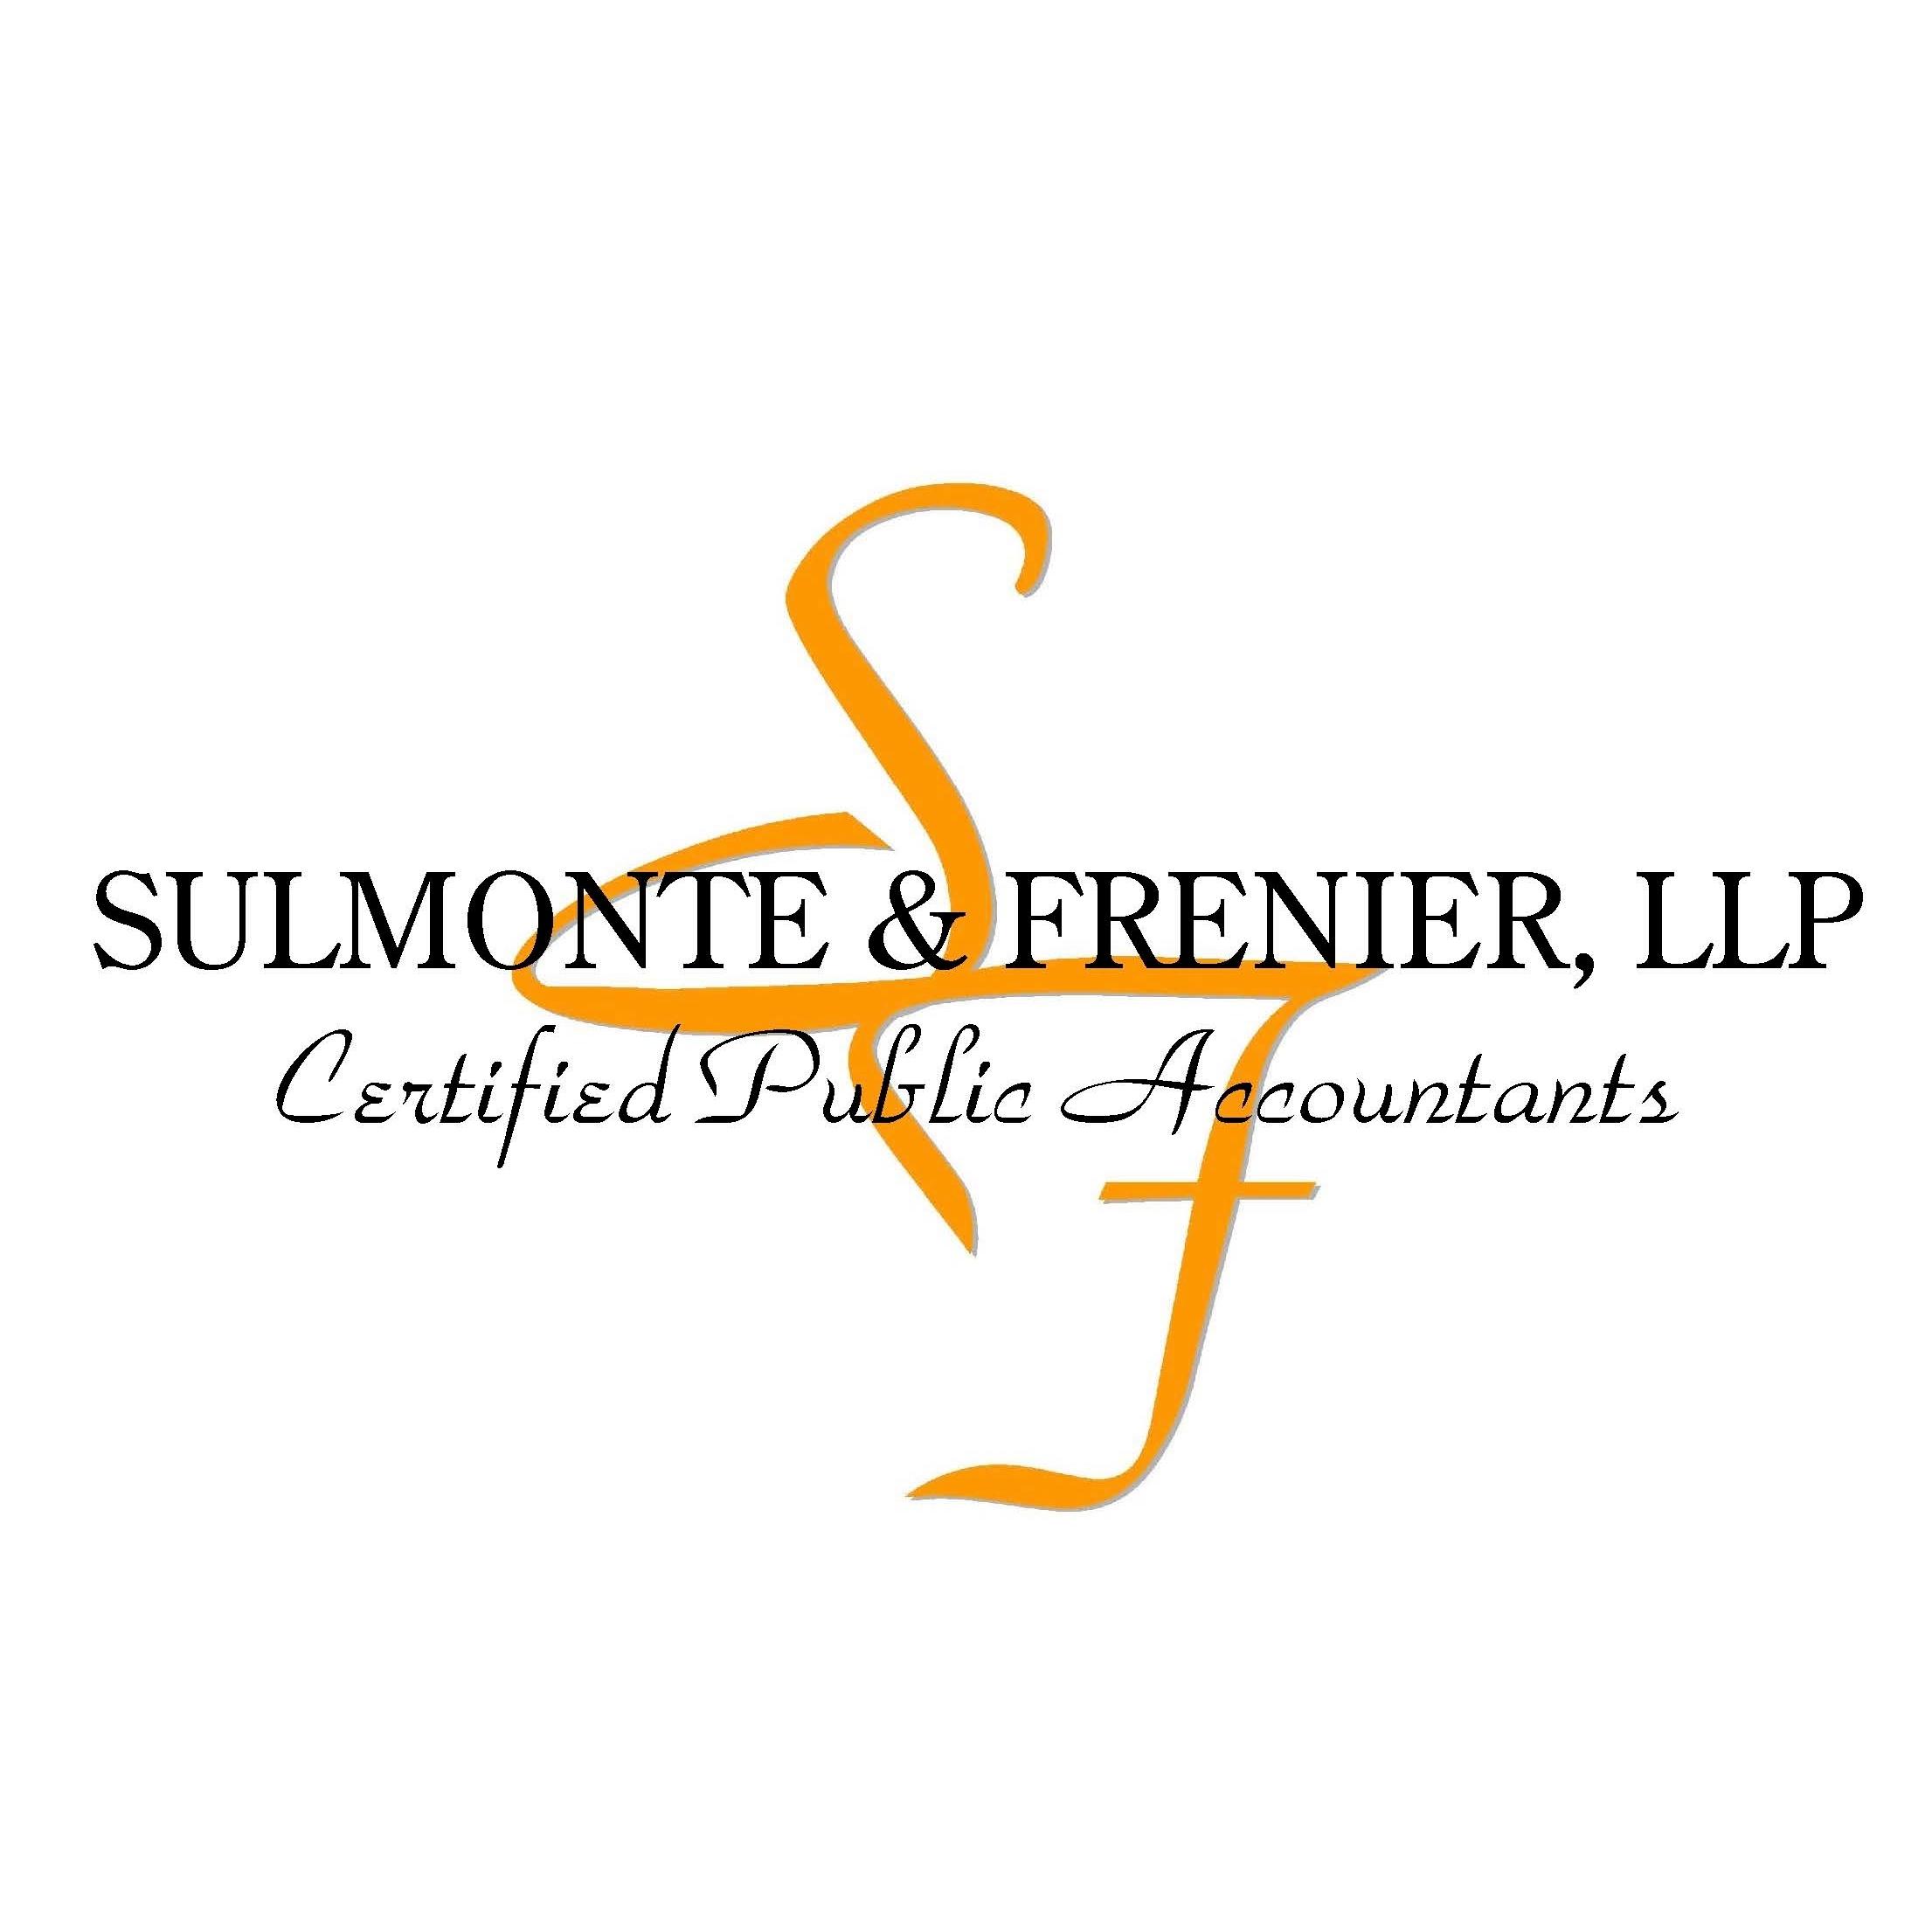 Sulmonte & Frenier, LLP